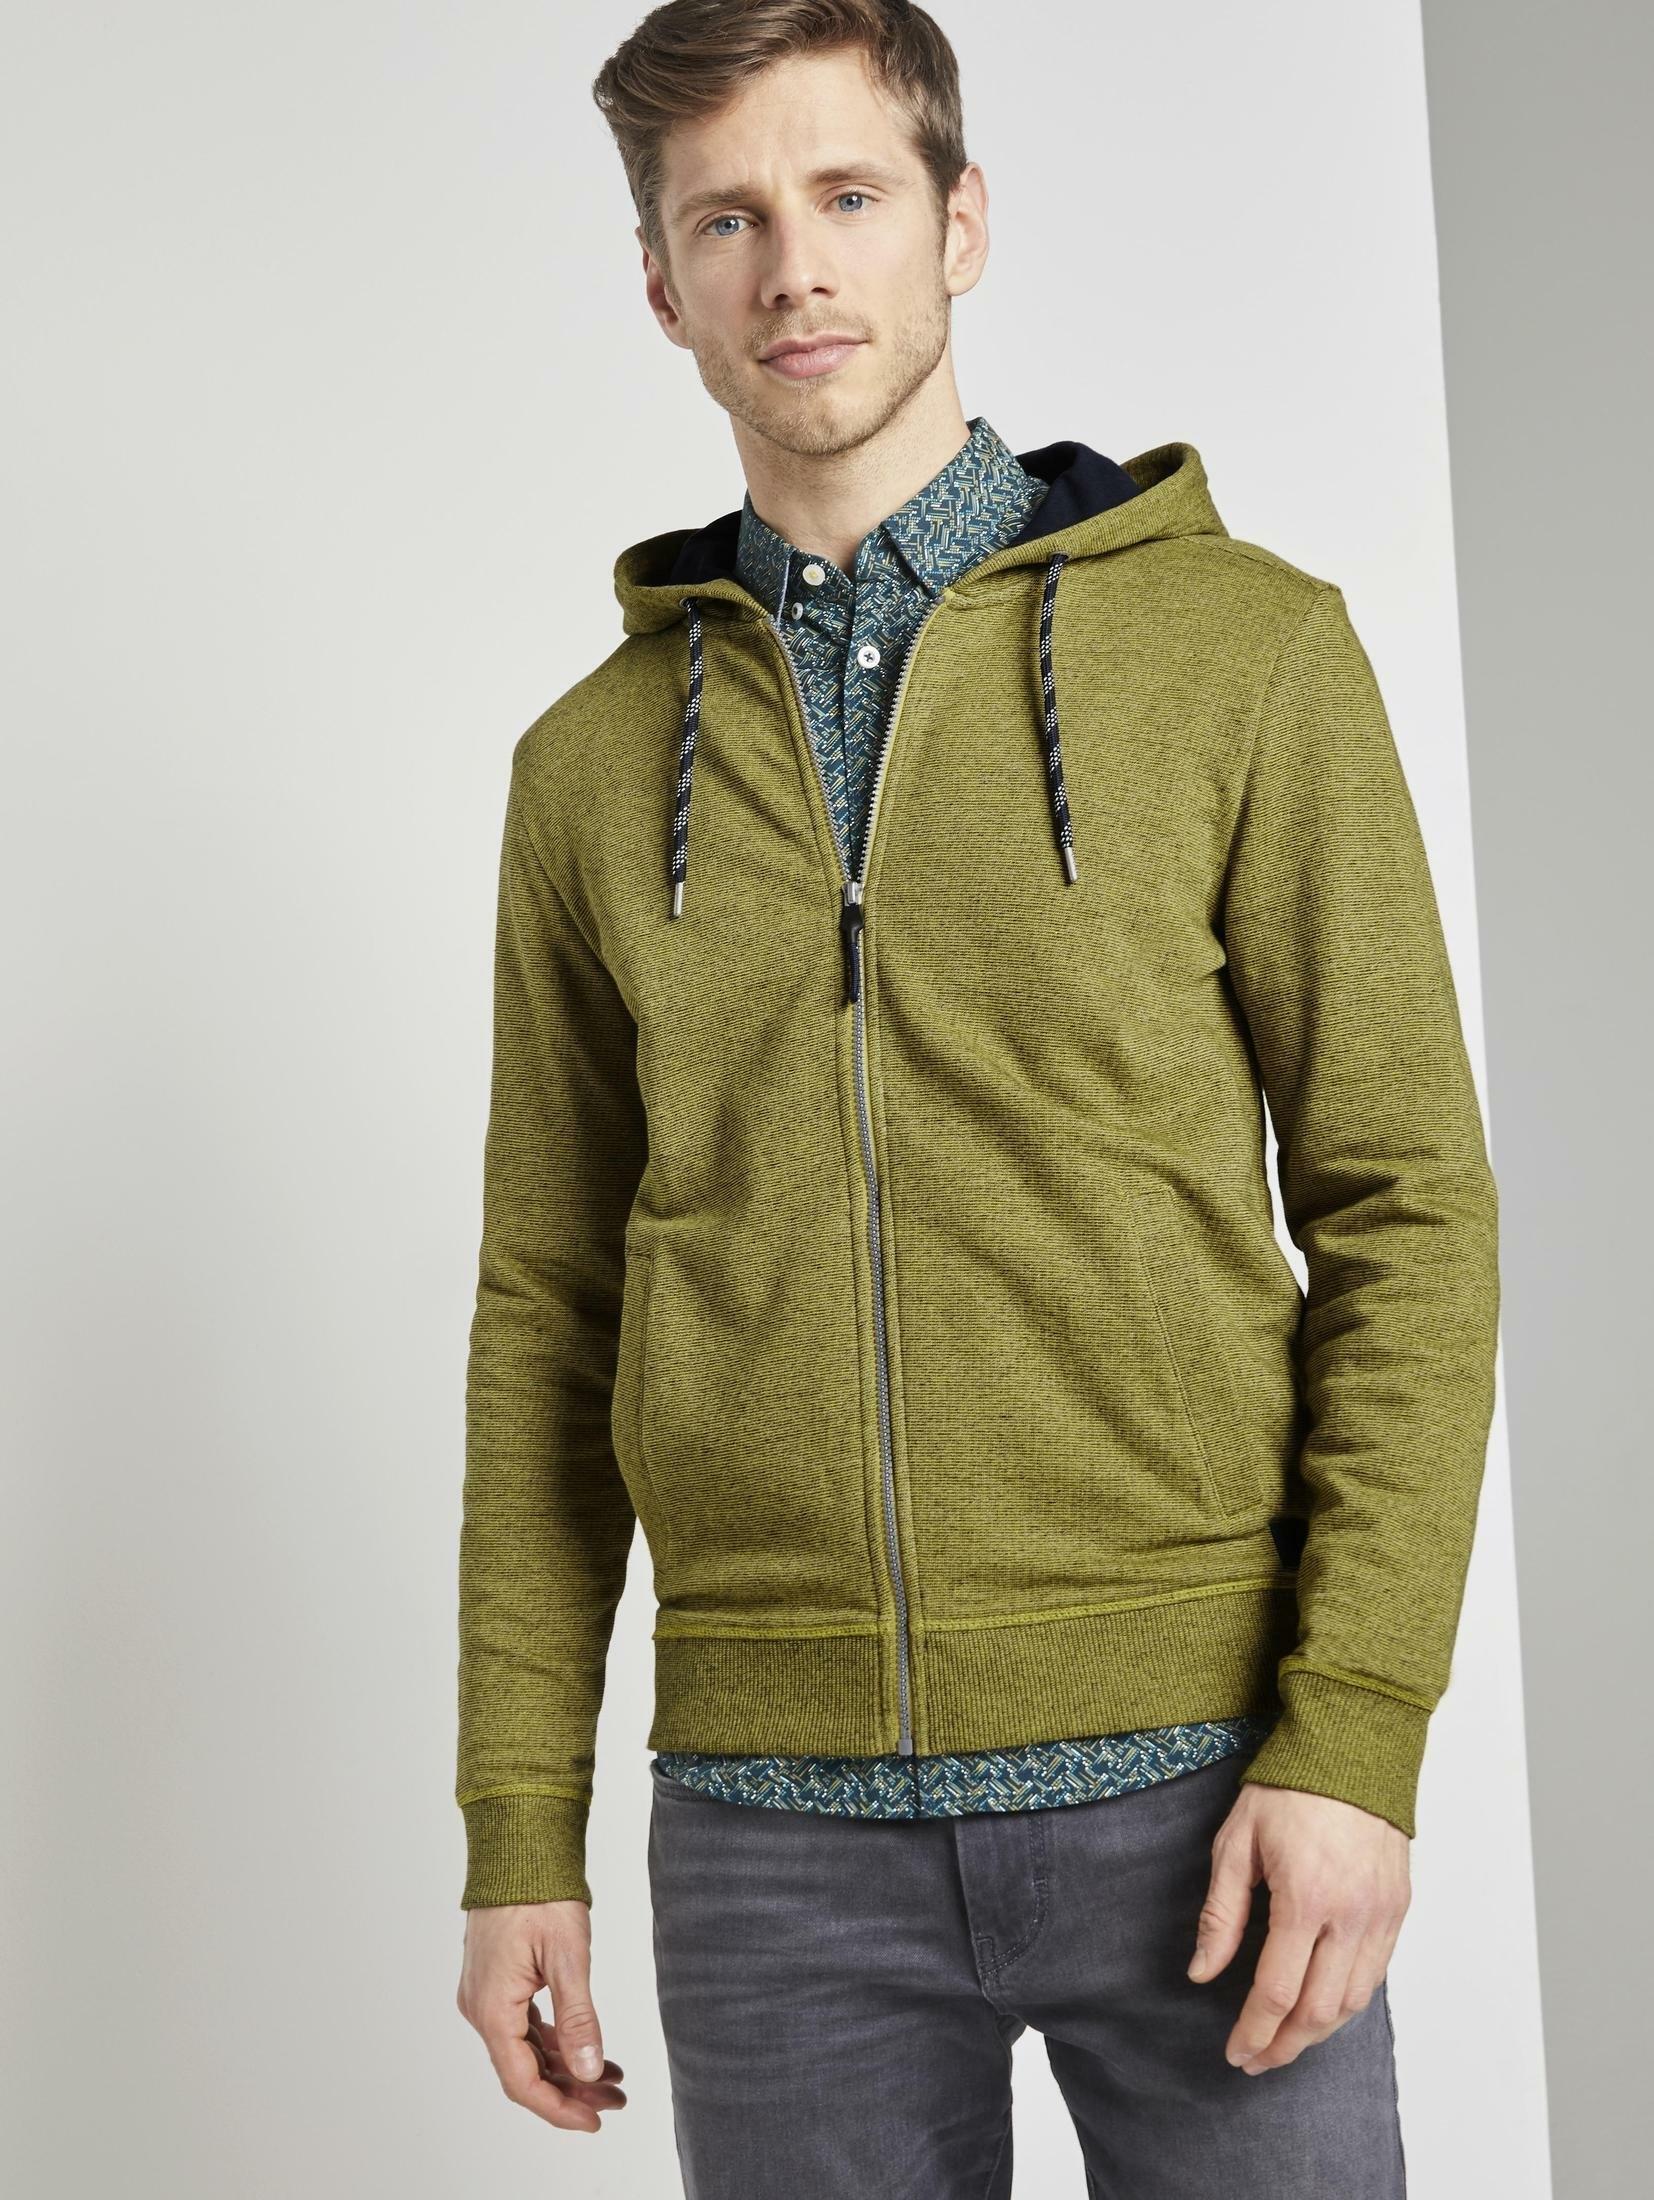 Tom Tailor hoodie »Strukturierte Sweatjacke« voordelig en veilig online kopen